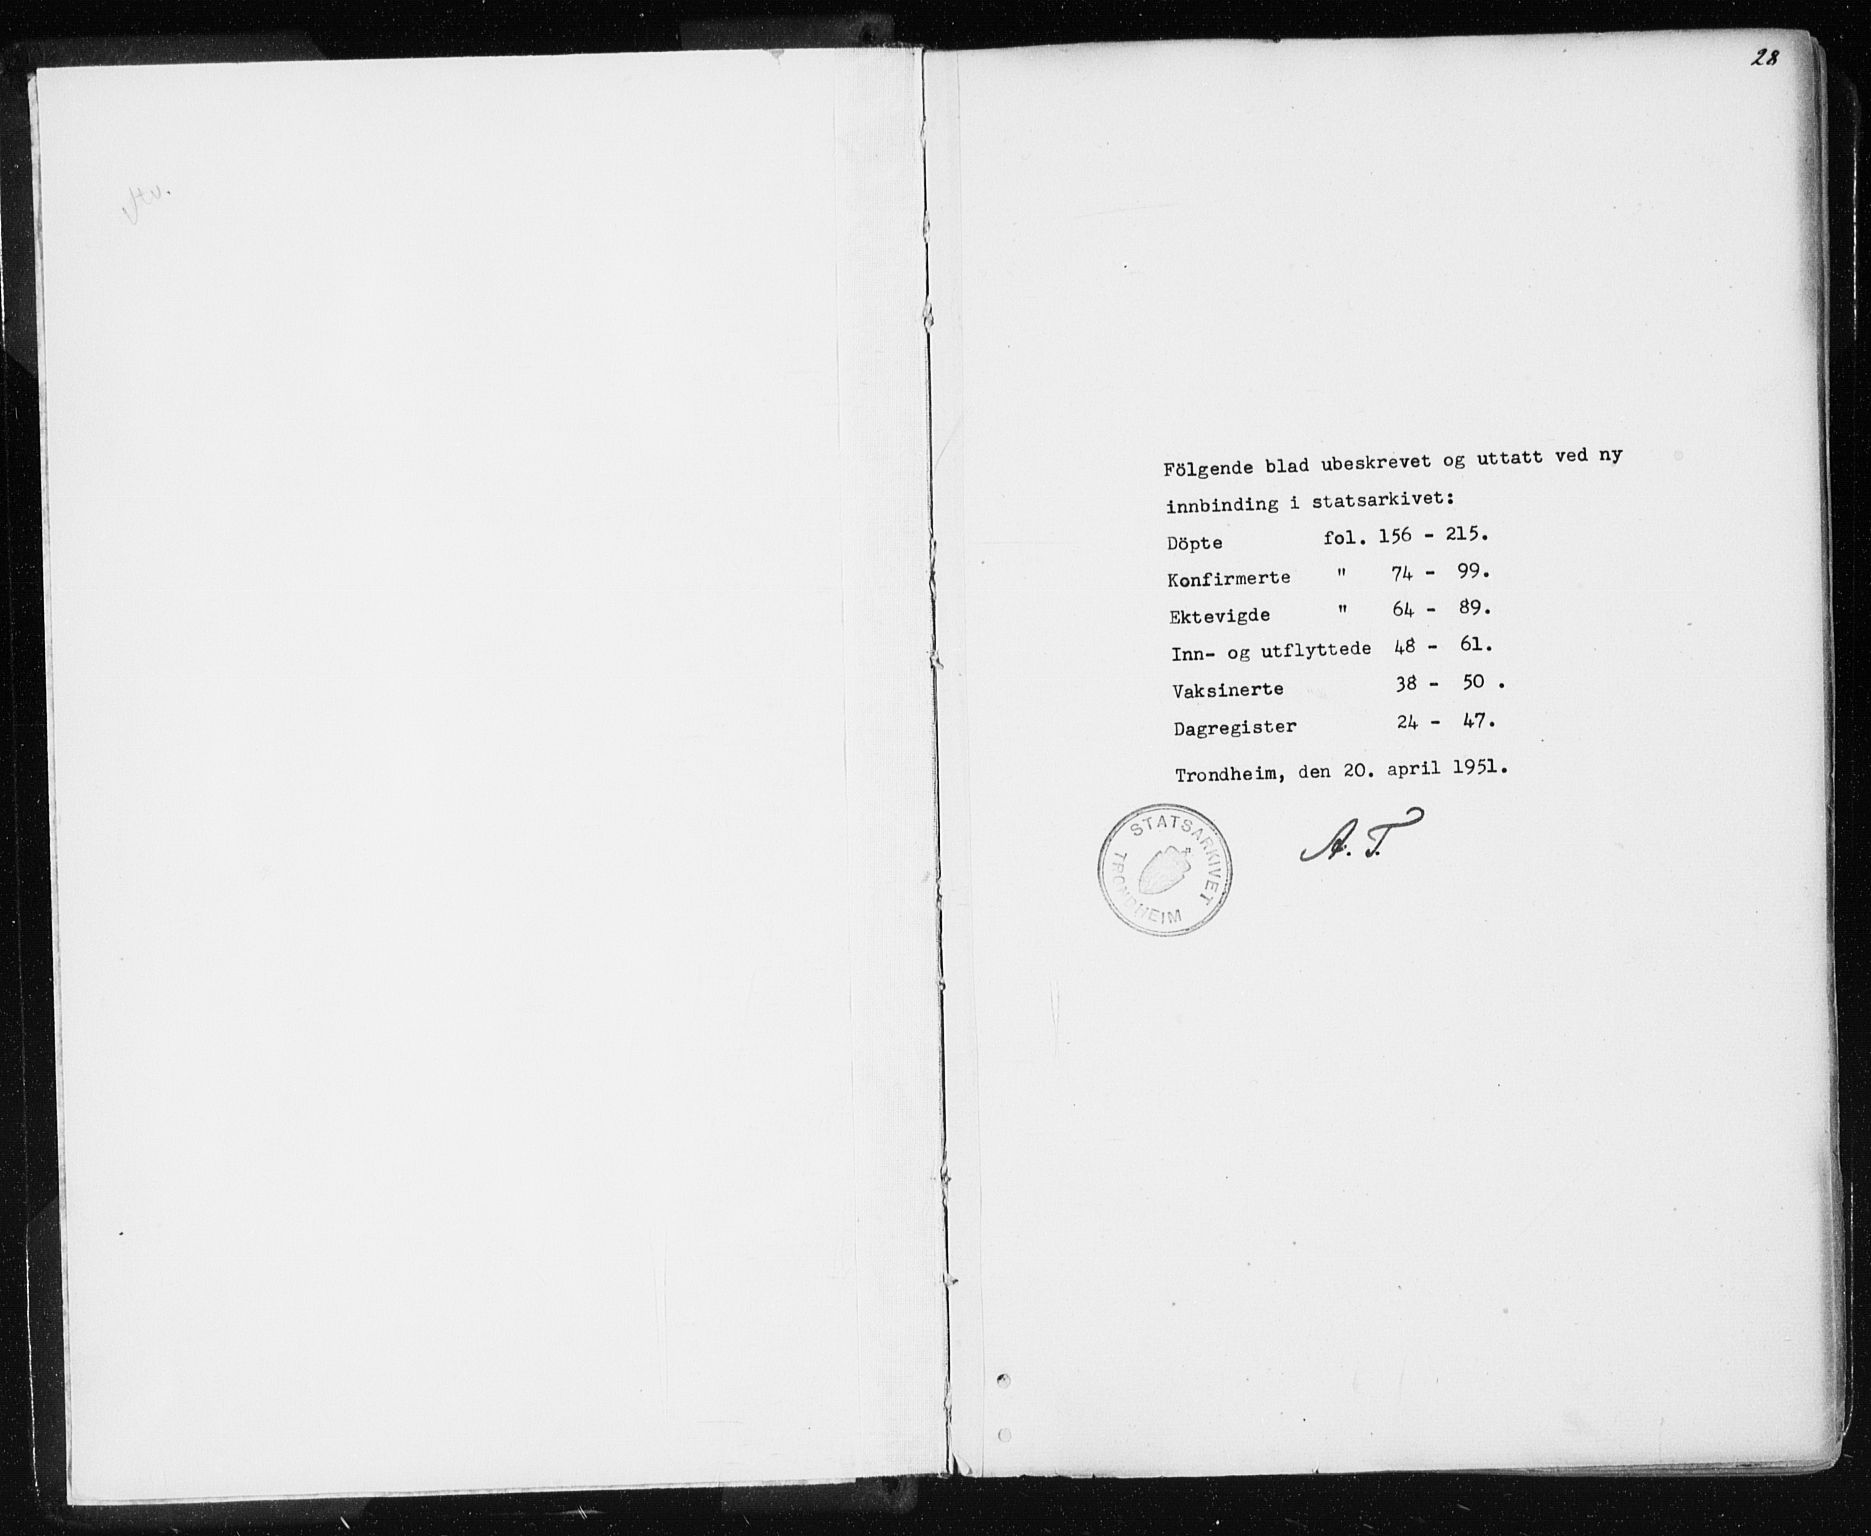 SAT, Ministerialprotokoller, klokkerbøker og fødselsregistre - Sør-Trøndelag, 601/L0053: Parish register (official) no. 601A21, 1857-1865, p. 28